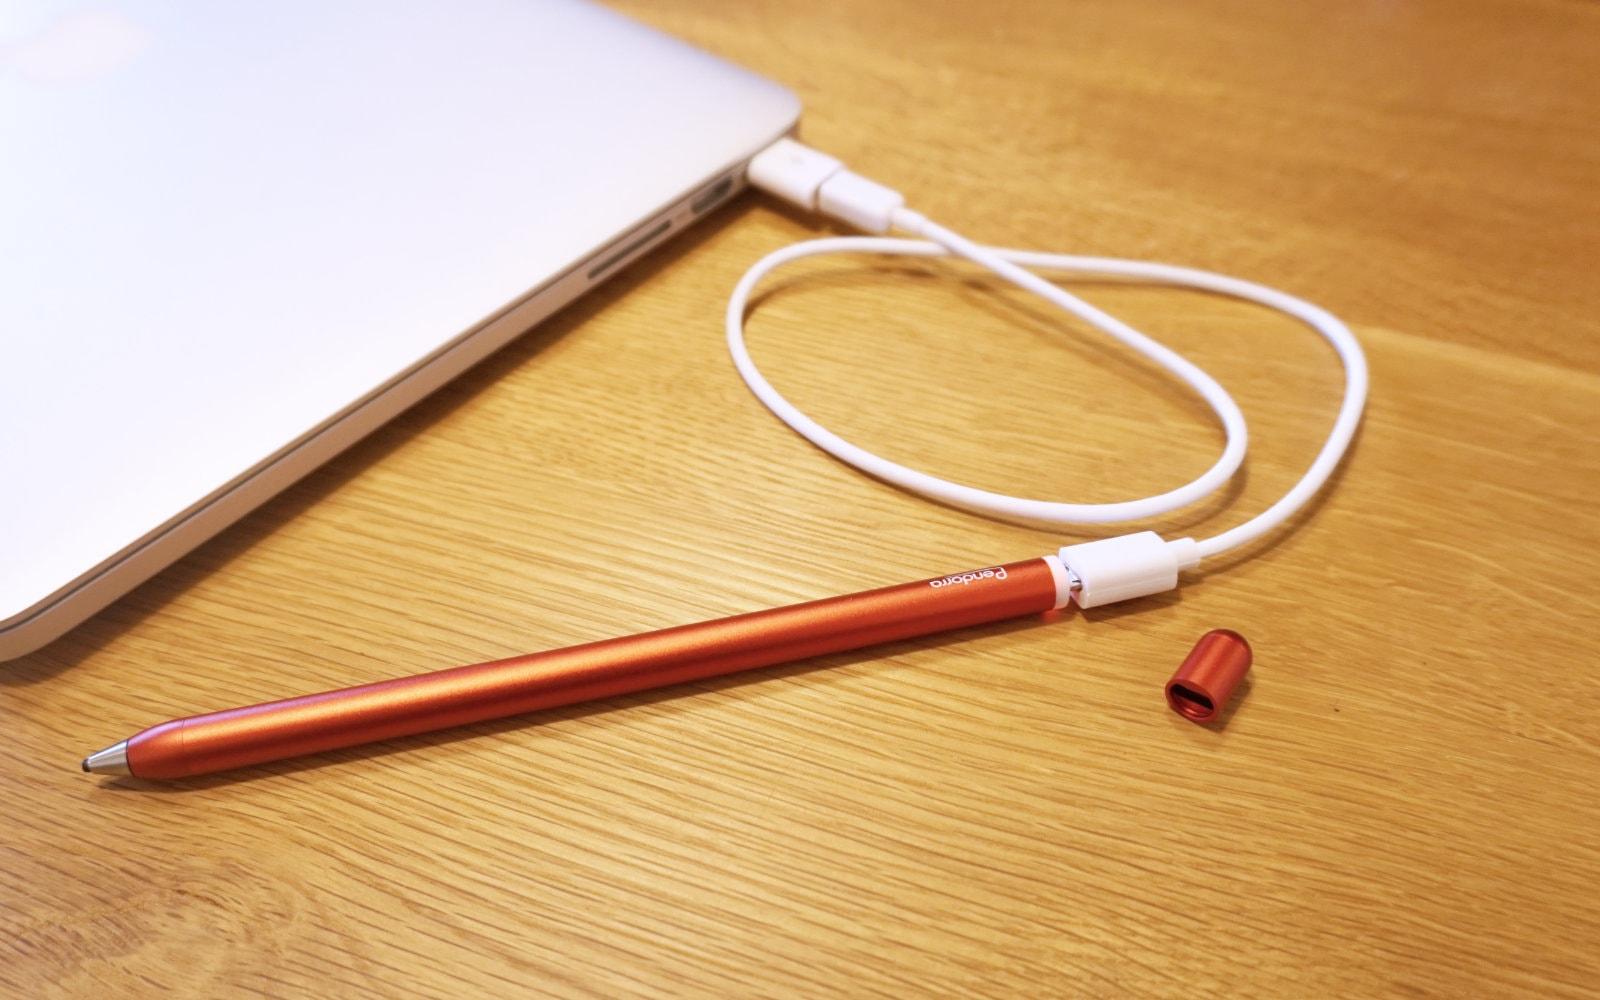 Pendorra充電式タッチペンをMacBook ProにUSBで繋げて充電